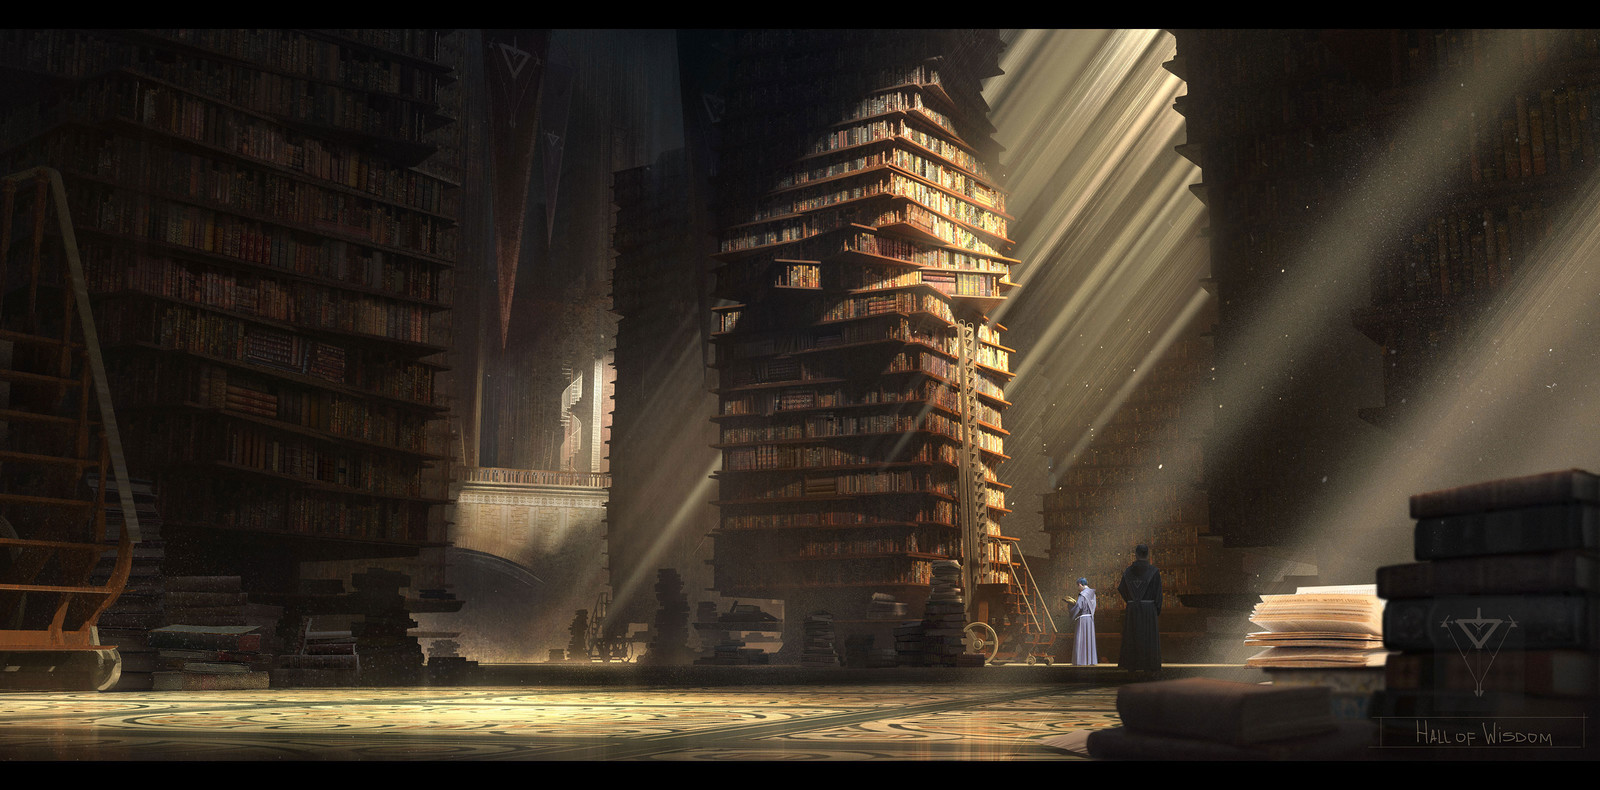 Hall of Wisdom